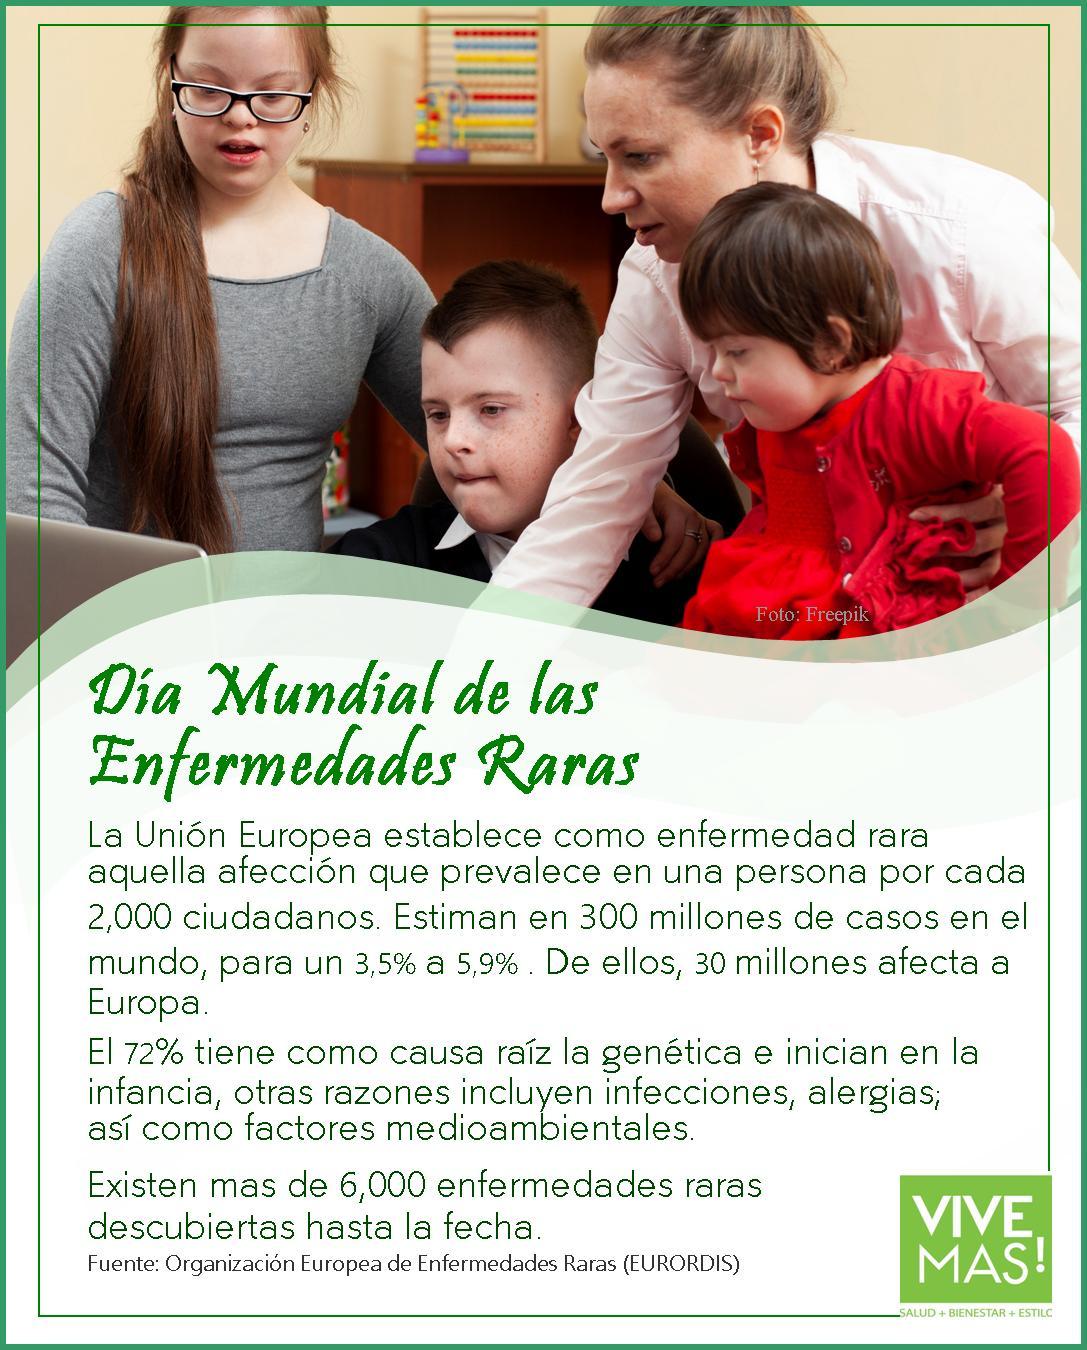 DIA-MUNDIAL-ENFERMEDADES-RARAS-28-FEBRERO-2021